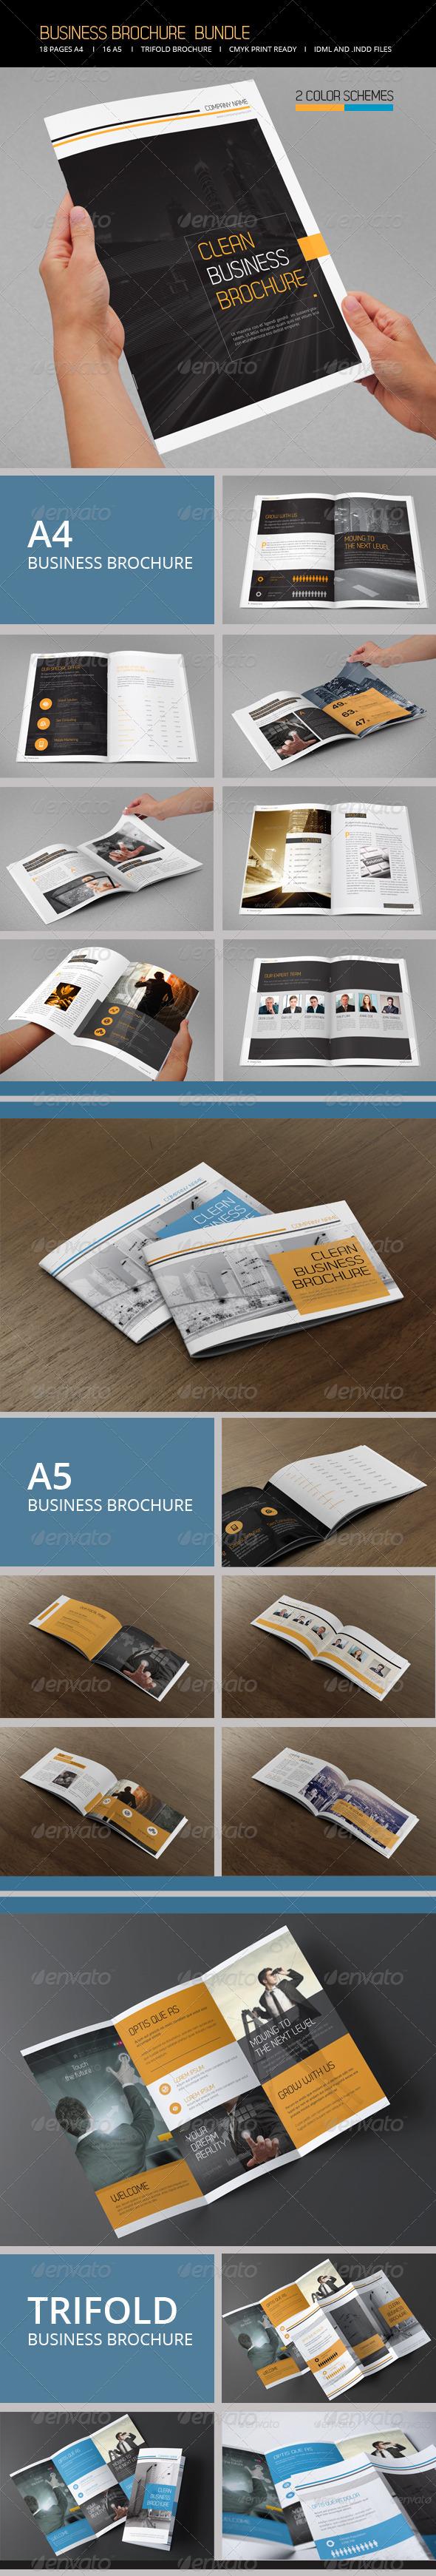 GraphicRiver Business Brochure Bundle 6701655